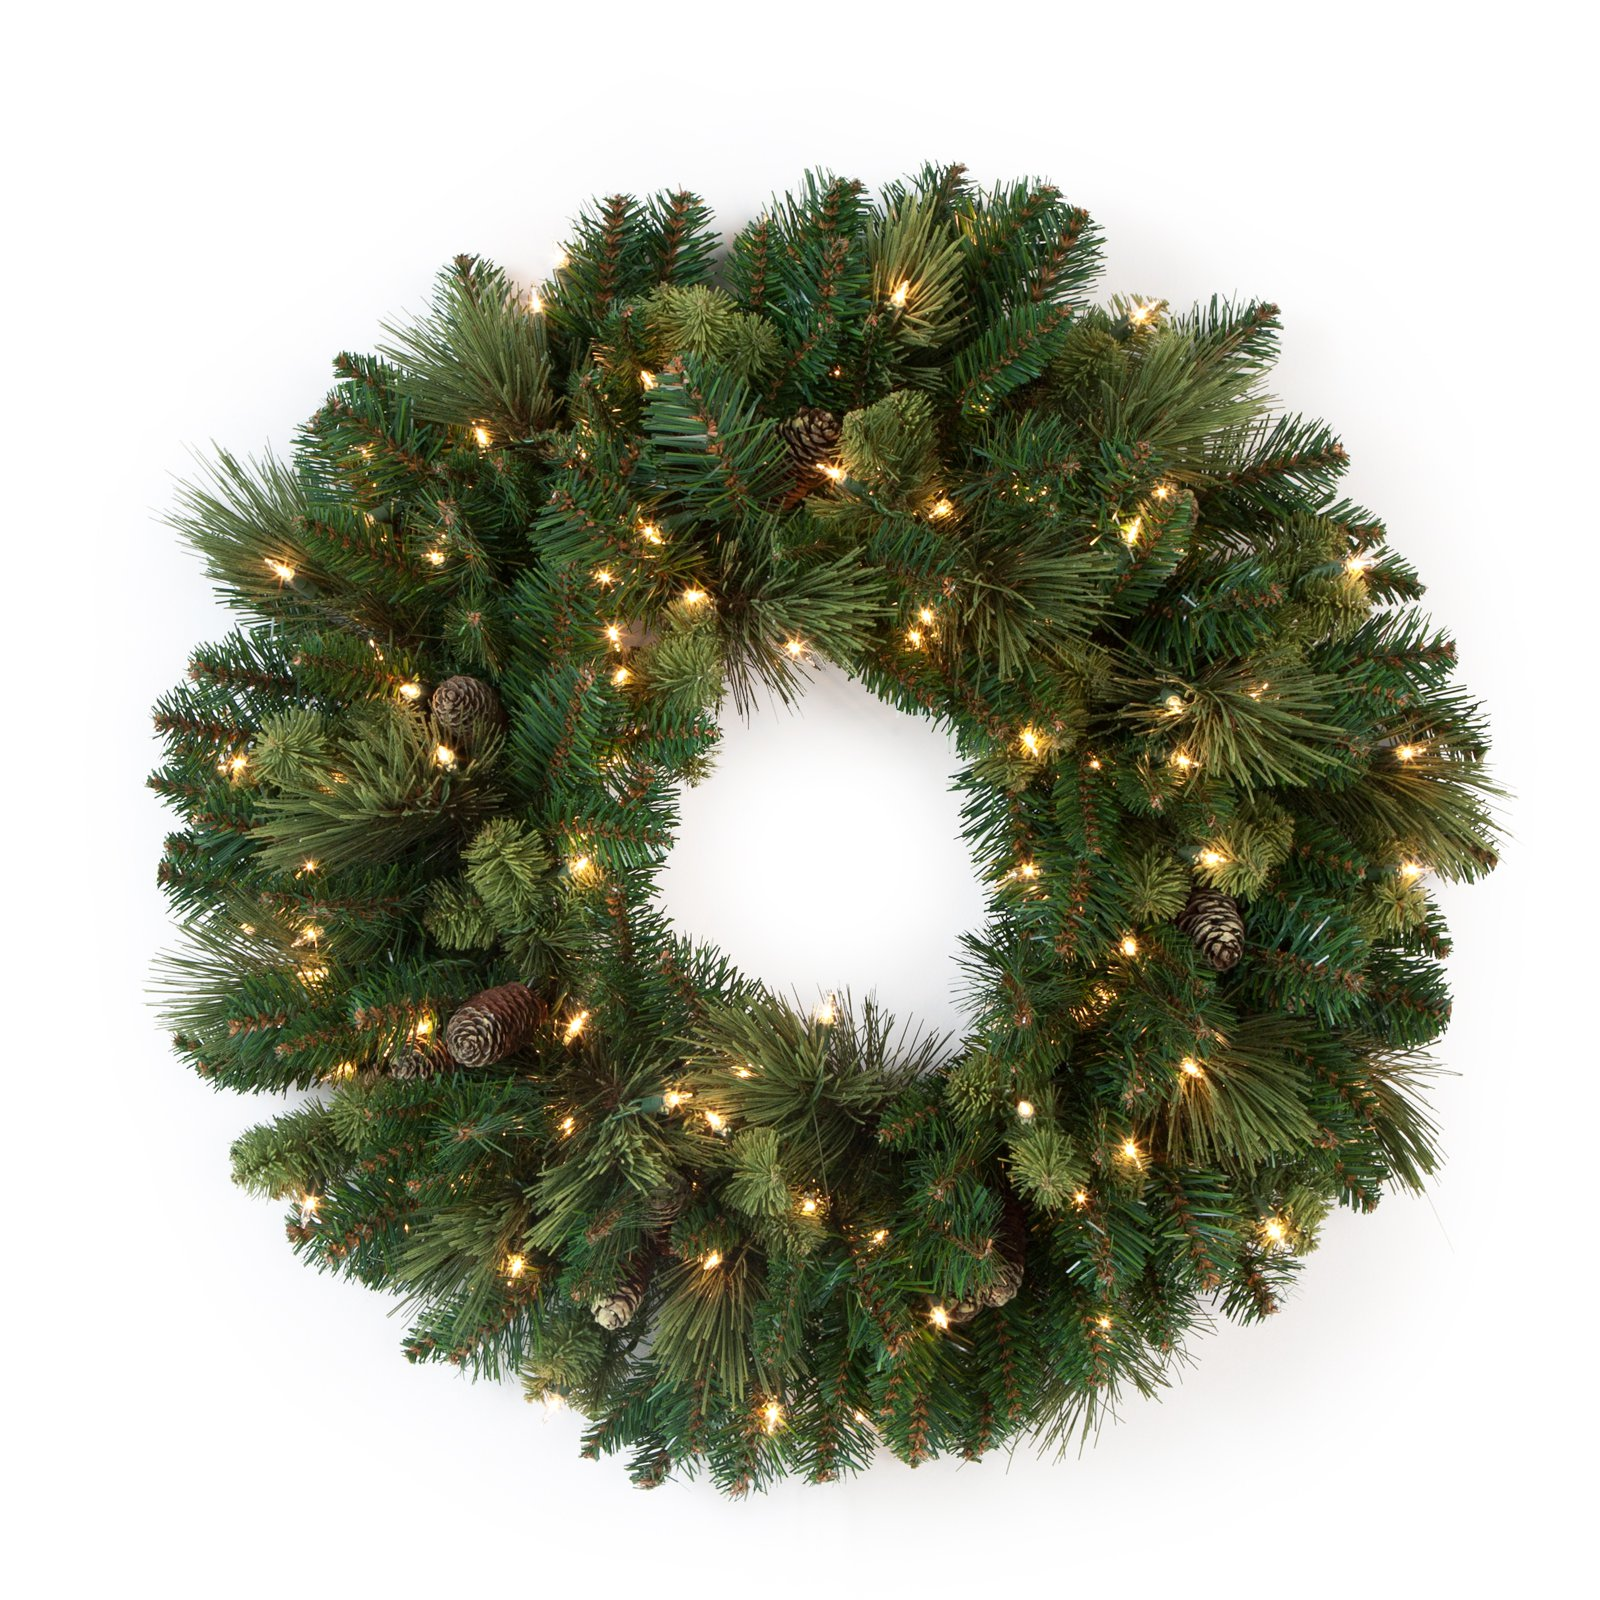 30 in. Carolina Pine Wreath